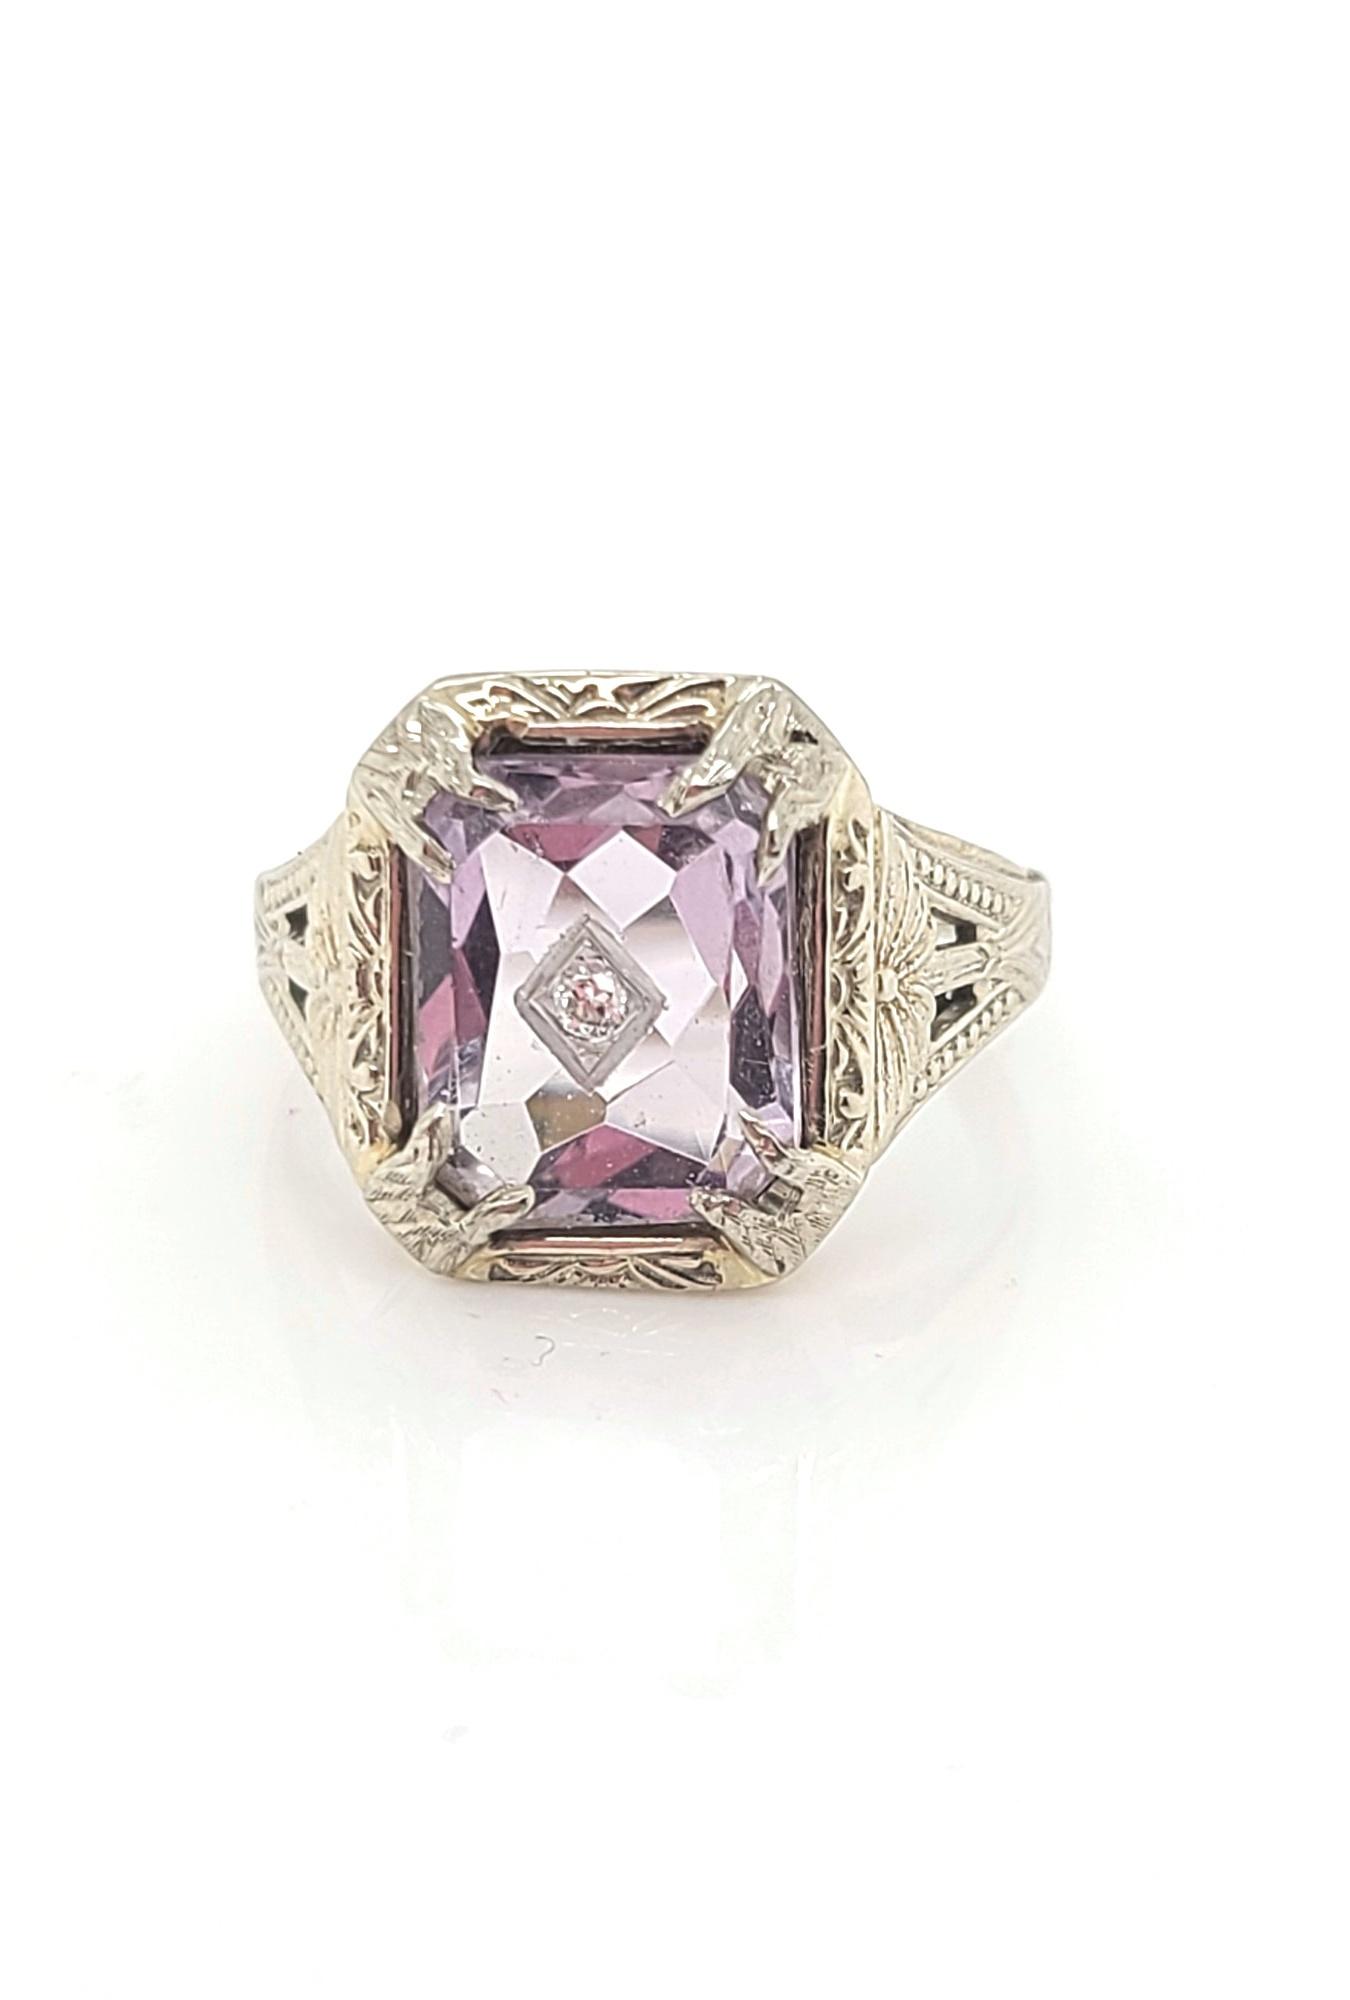 14kt White Gold, Amethyst & Diamond Inset Vintage Ring